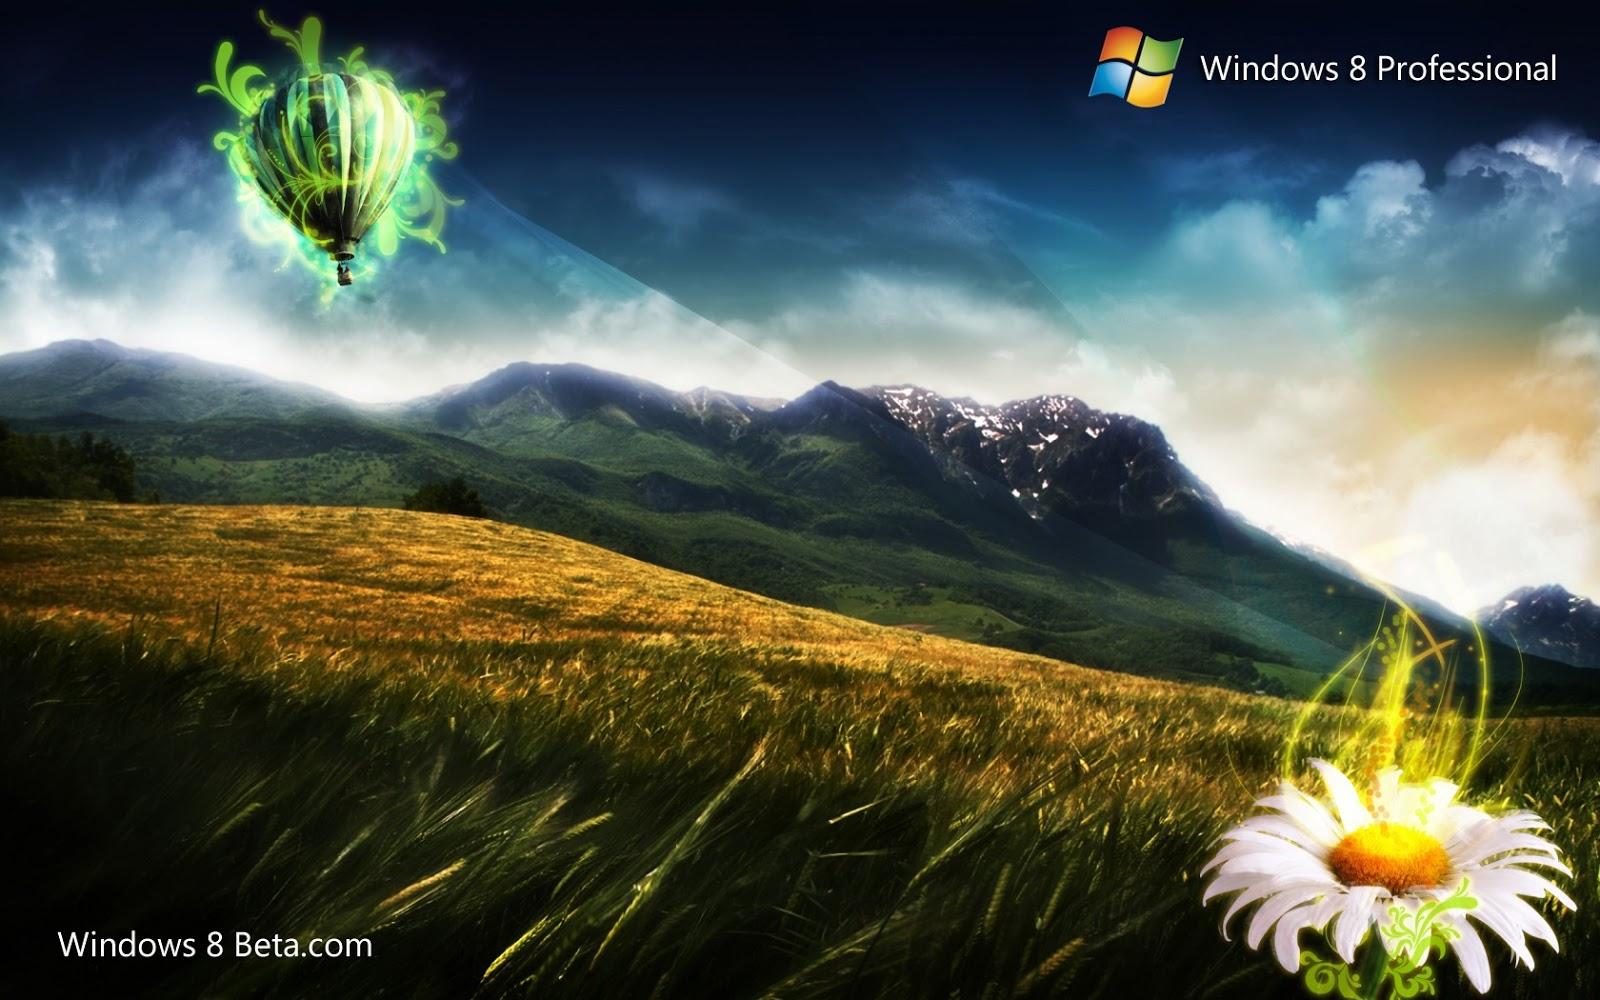 wallpaper hd 1080p free download